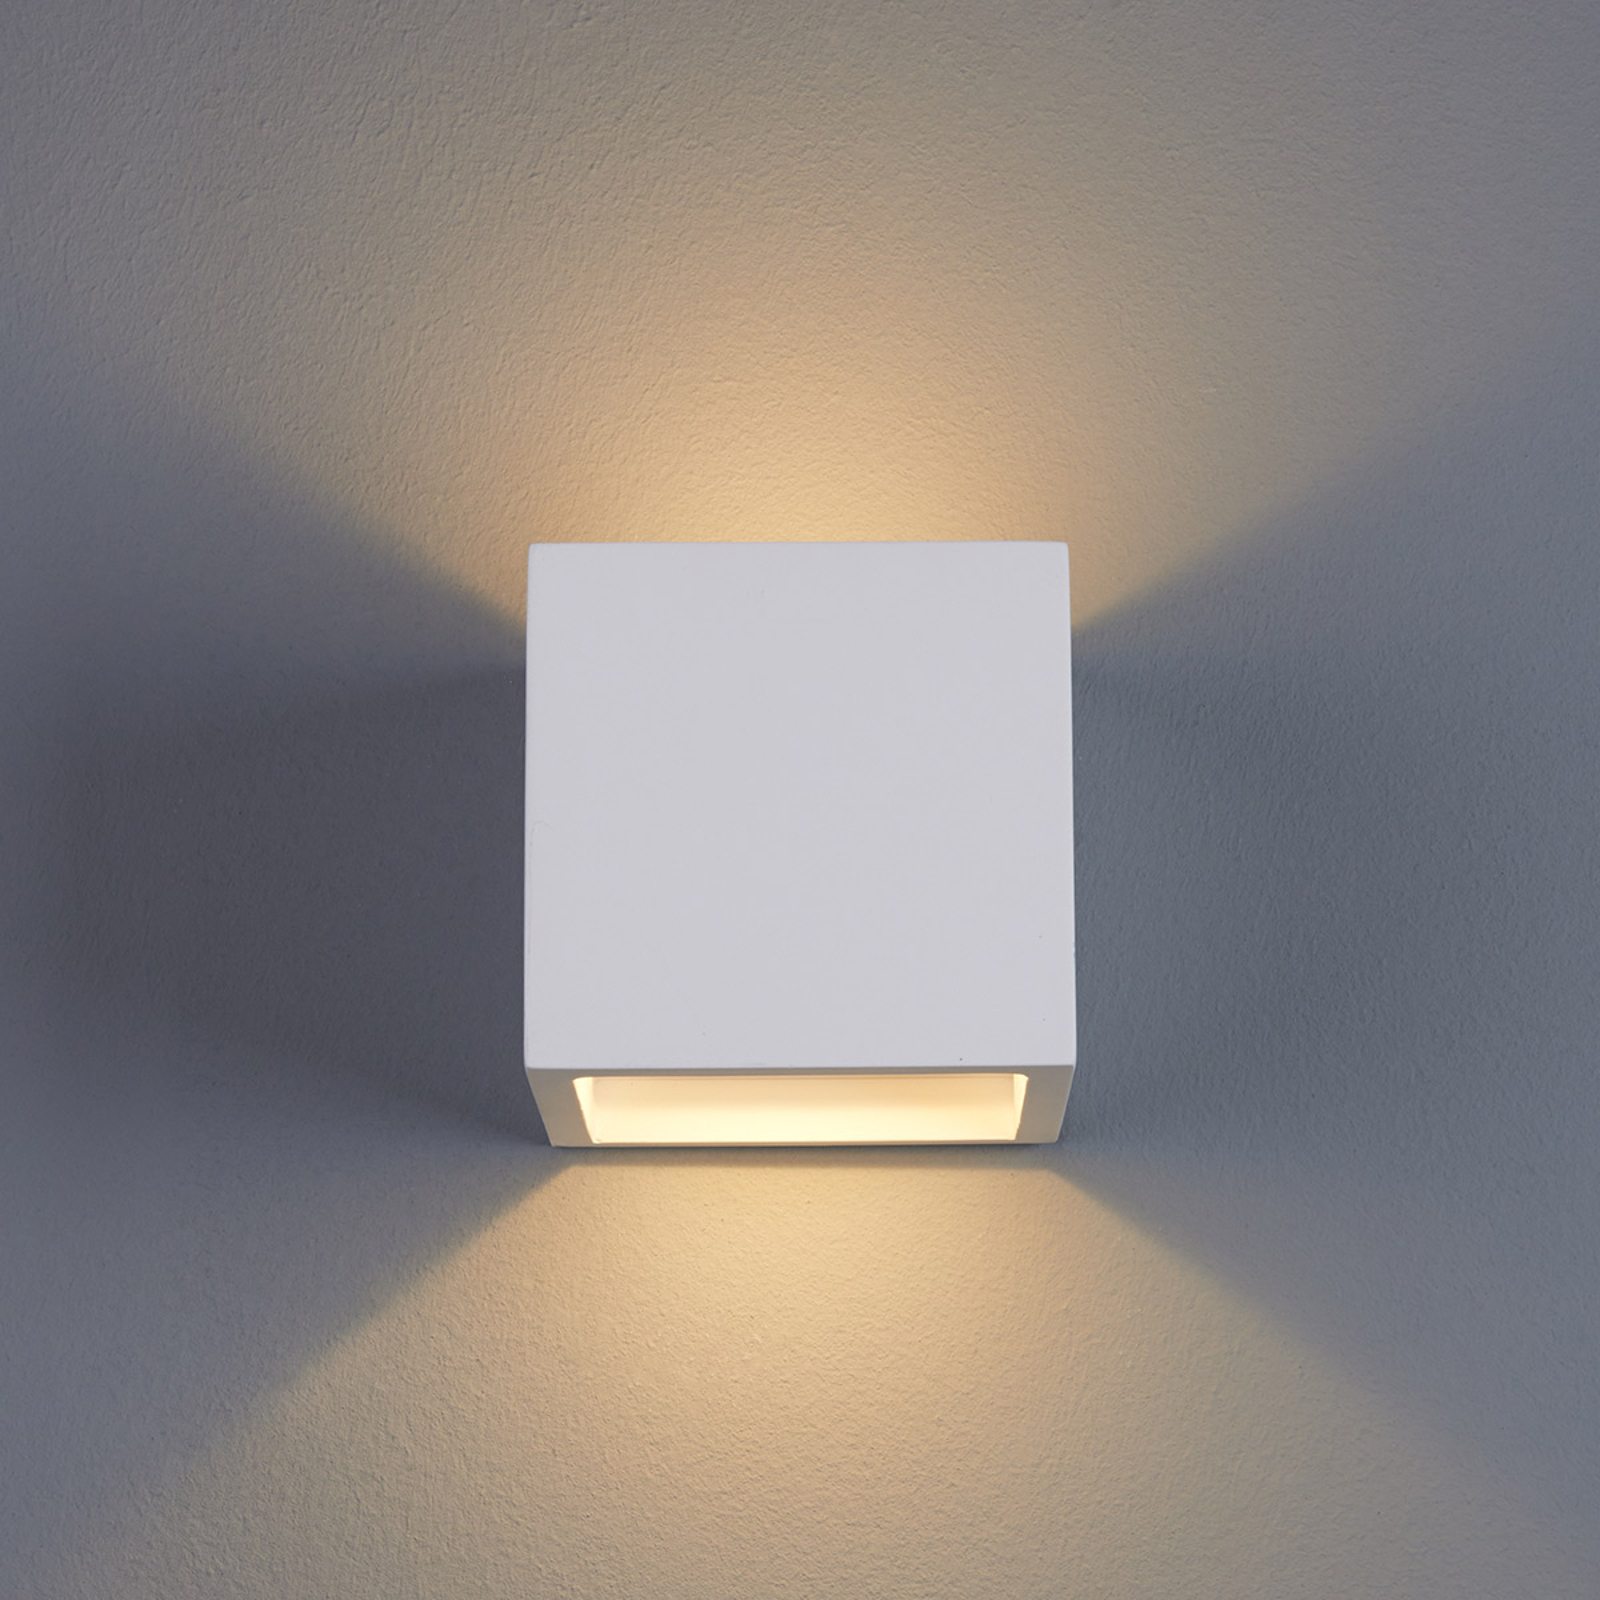 Würfelförmige LED-Wandleuchte Marita aus Gips